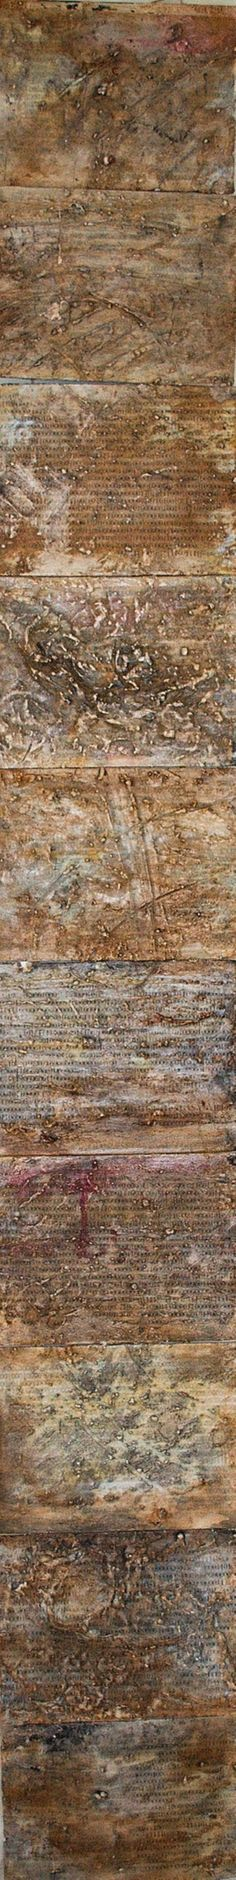 "Saatchi Art Artist Jana Trn; Painting, ""1679, ARECIBO MESSAGE"" #art"